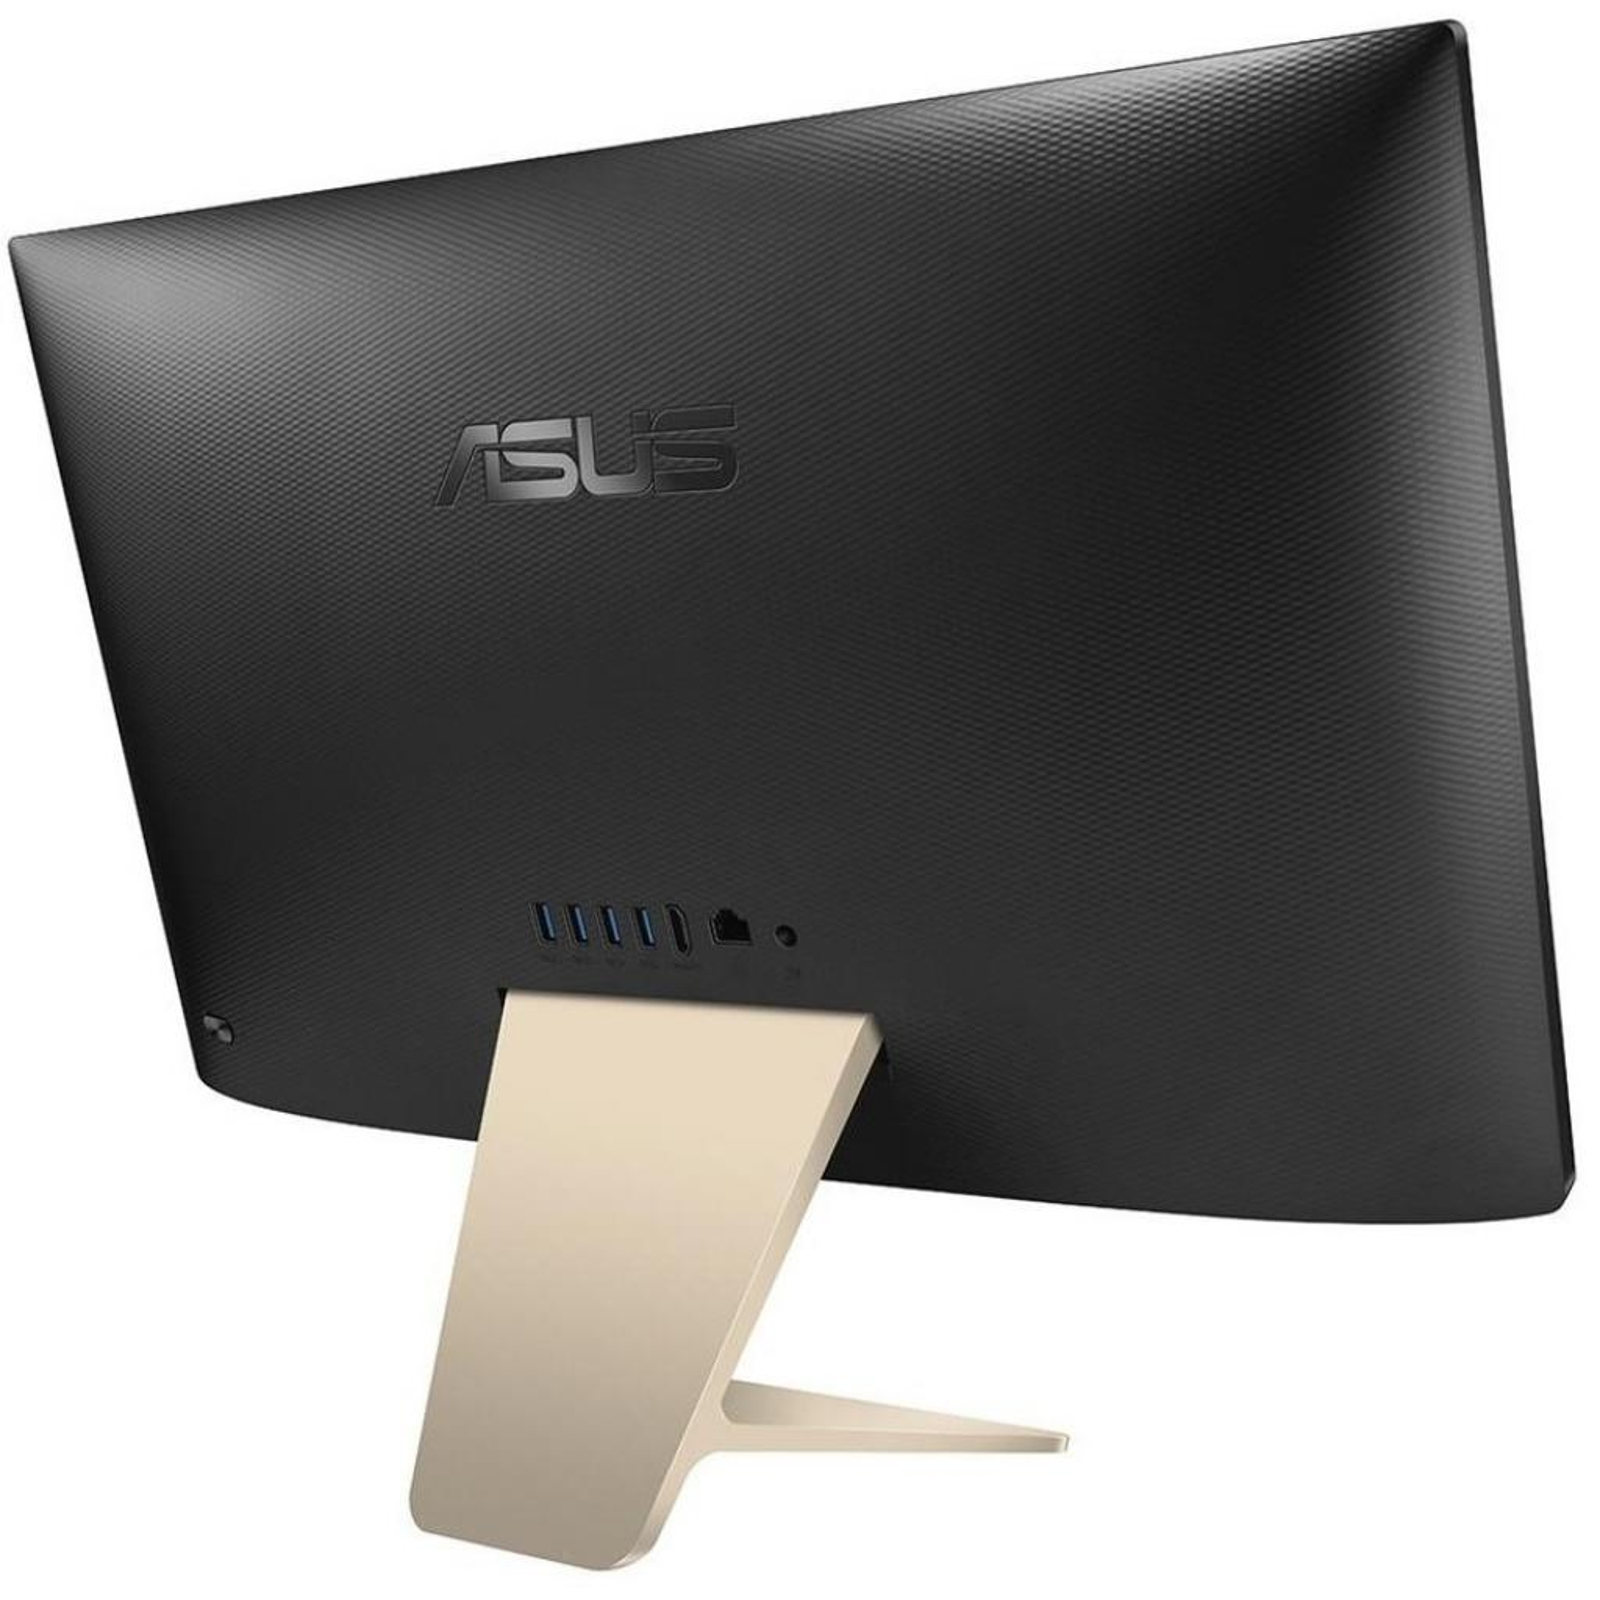 Комп'ютер ASUS V222FAK-BA030D (90PT02G1-M01450) зображення 7